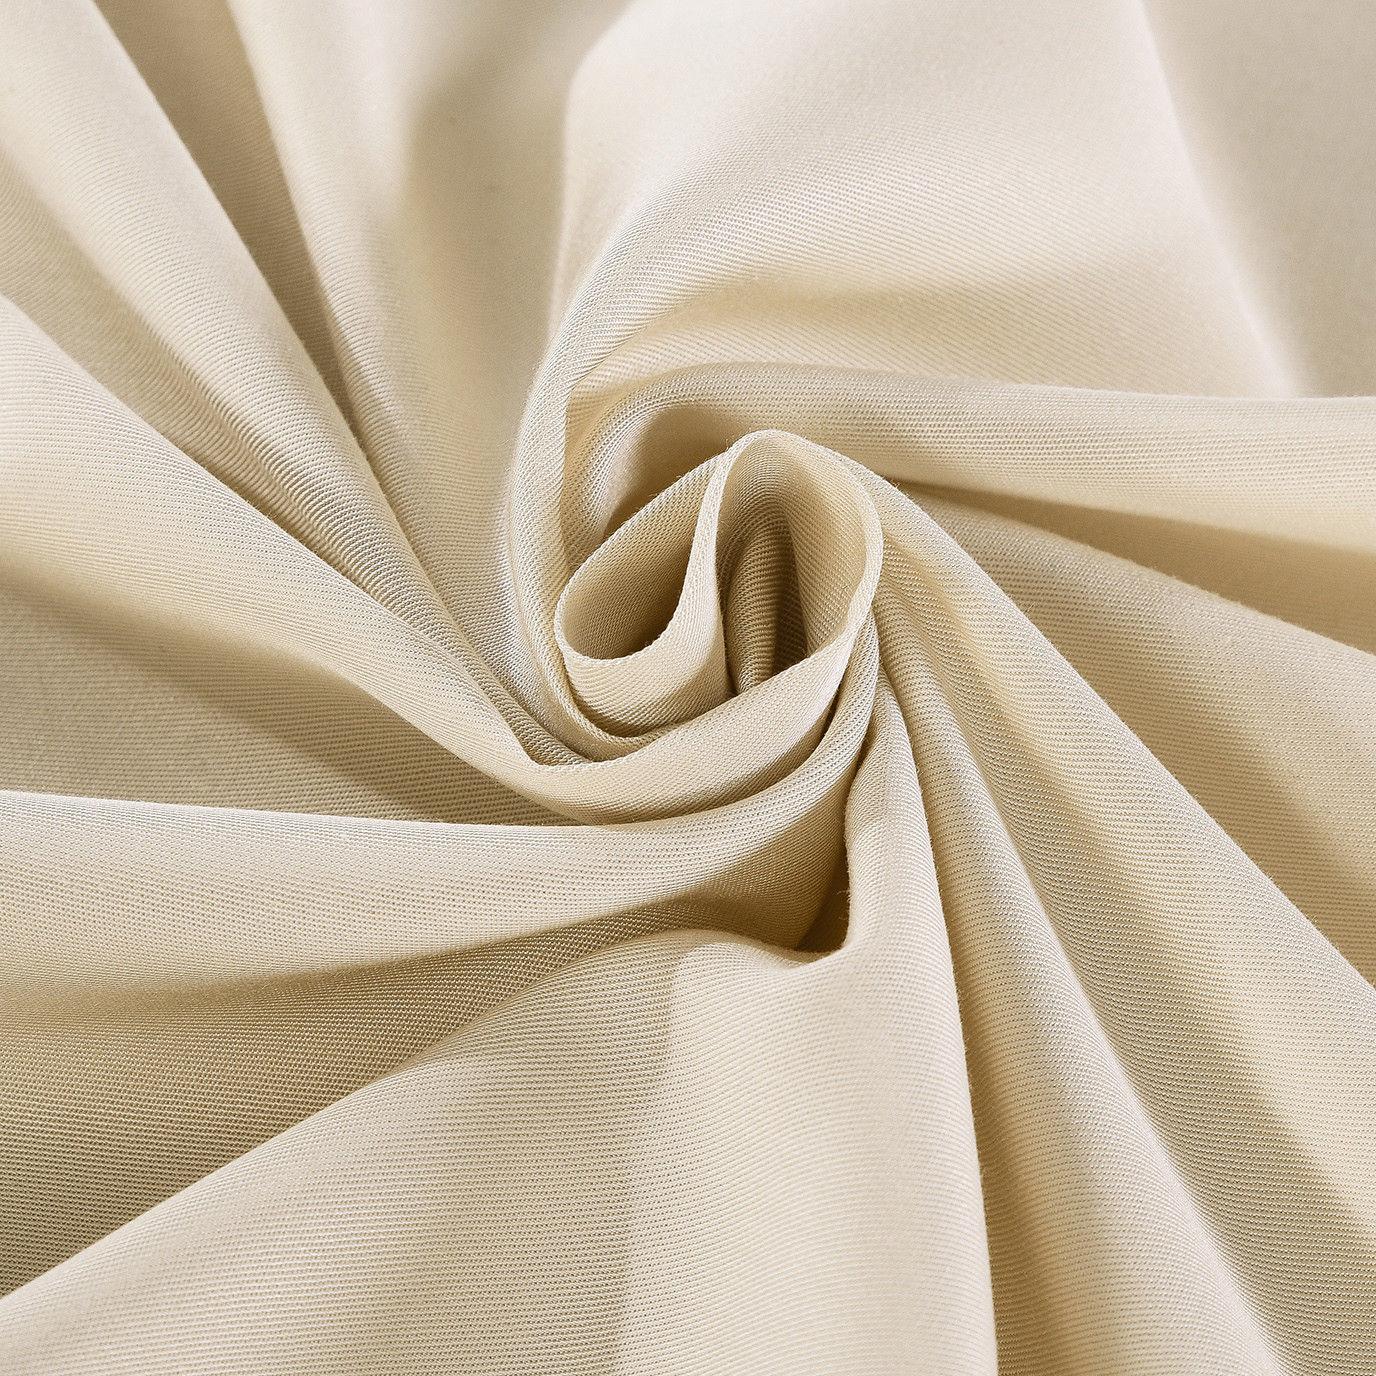 Royal-Comfort-Bamboo-Blended-Sheet-amp-Pillowcases-Set-1000TC-Ultra-Soft-Bedding thumbnail 22